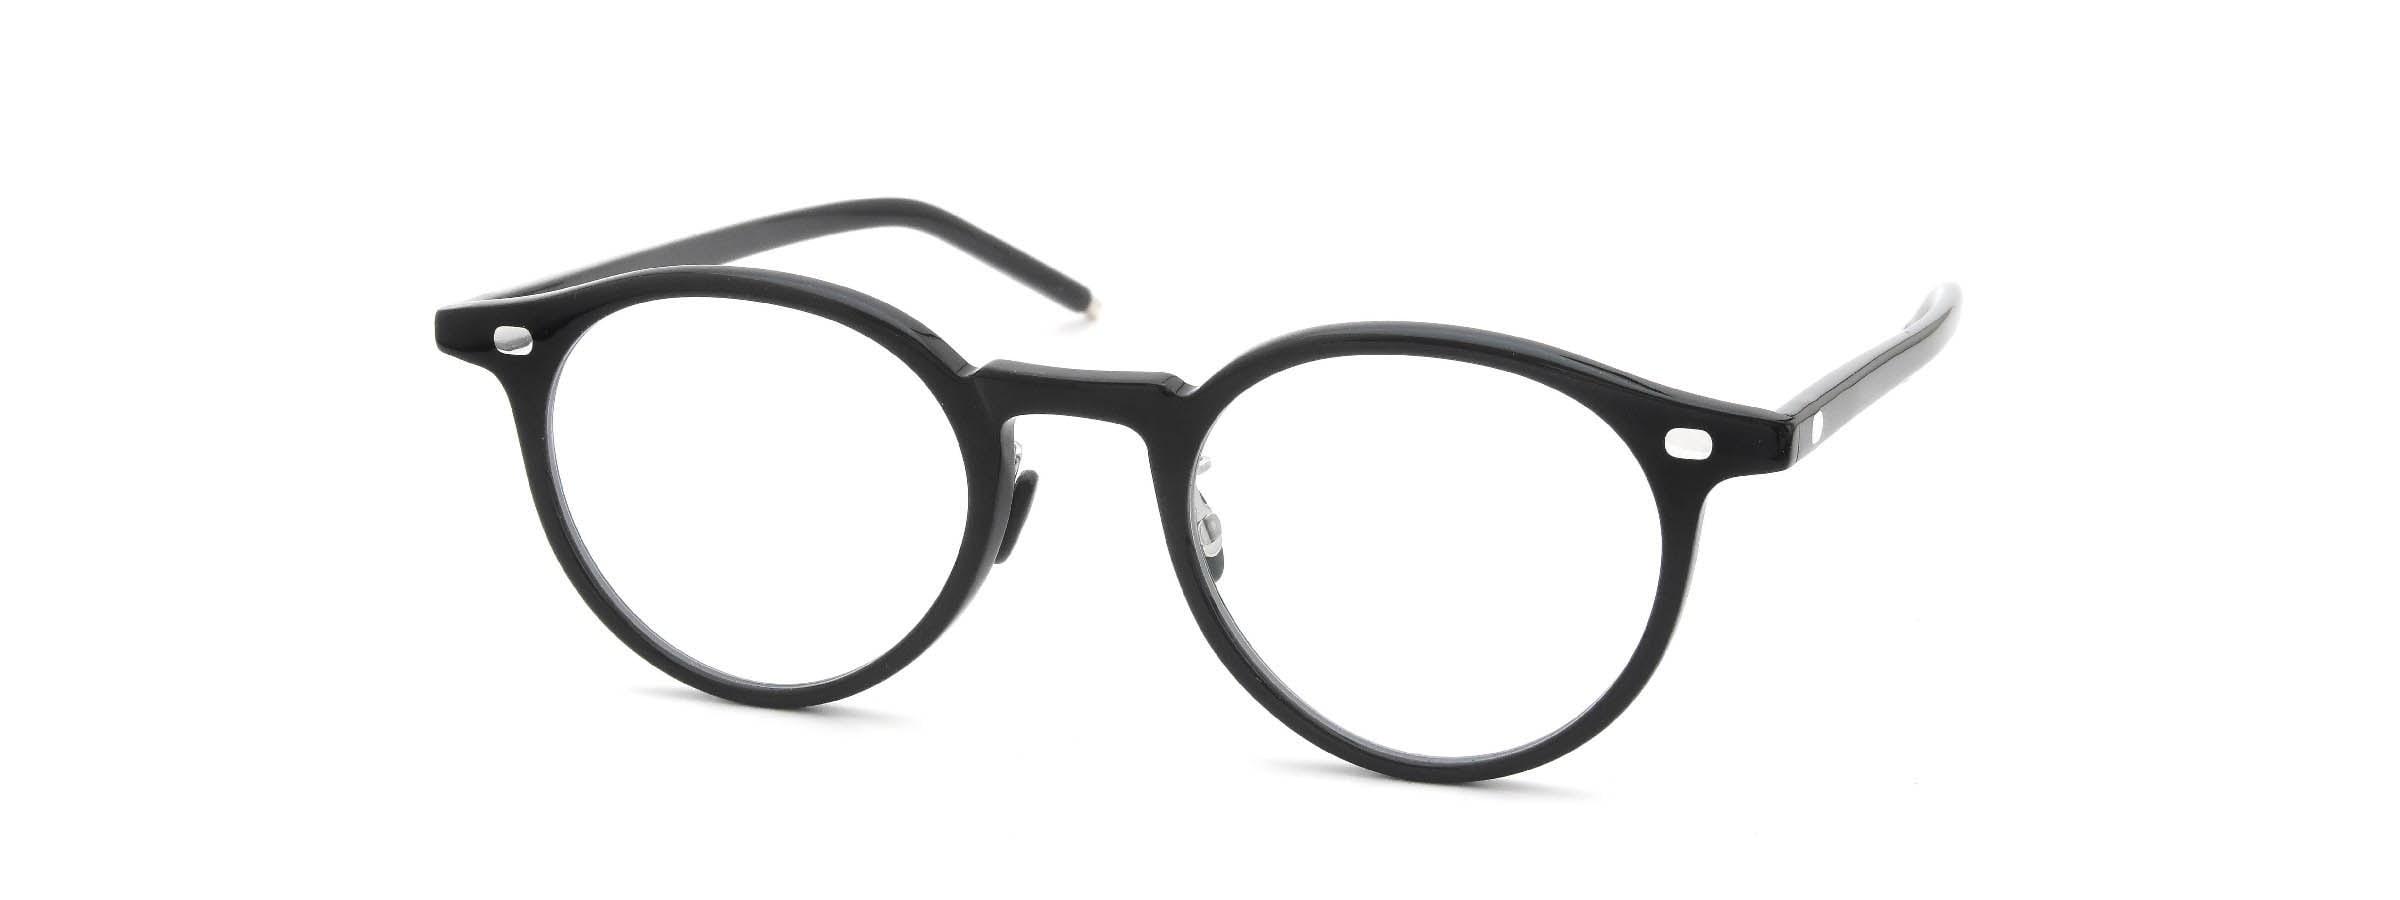 10 eyevan NO.3 Ⅲ 47size  c.1002S Black全体像